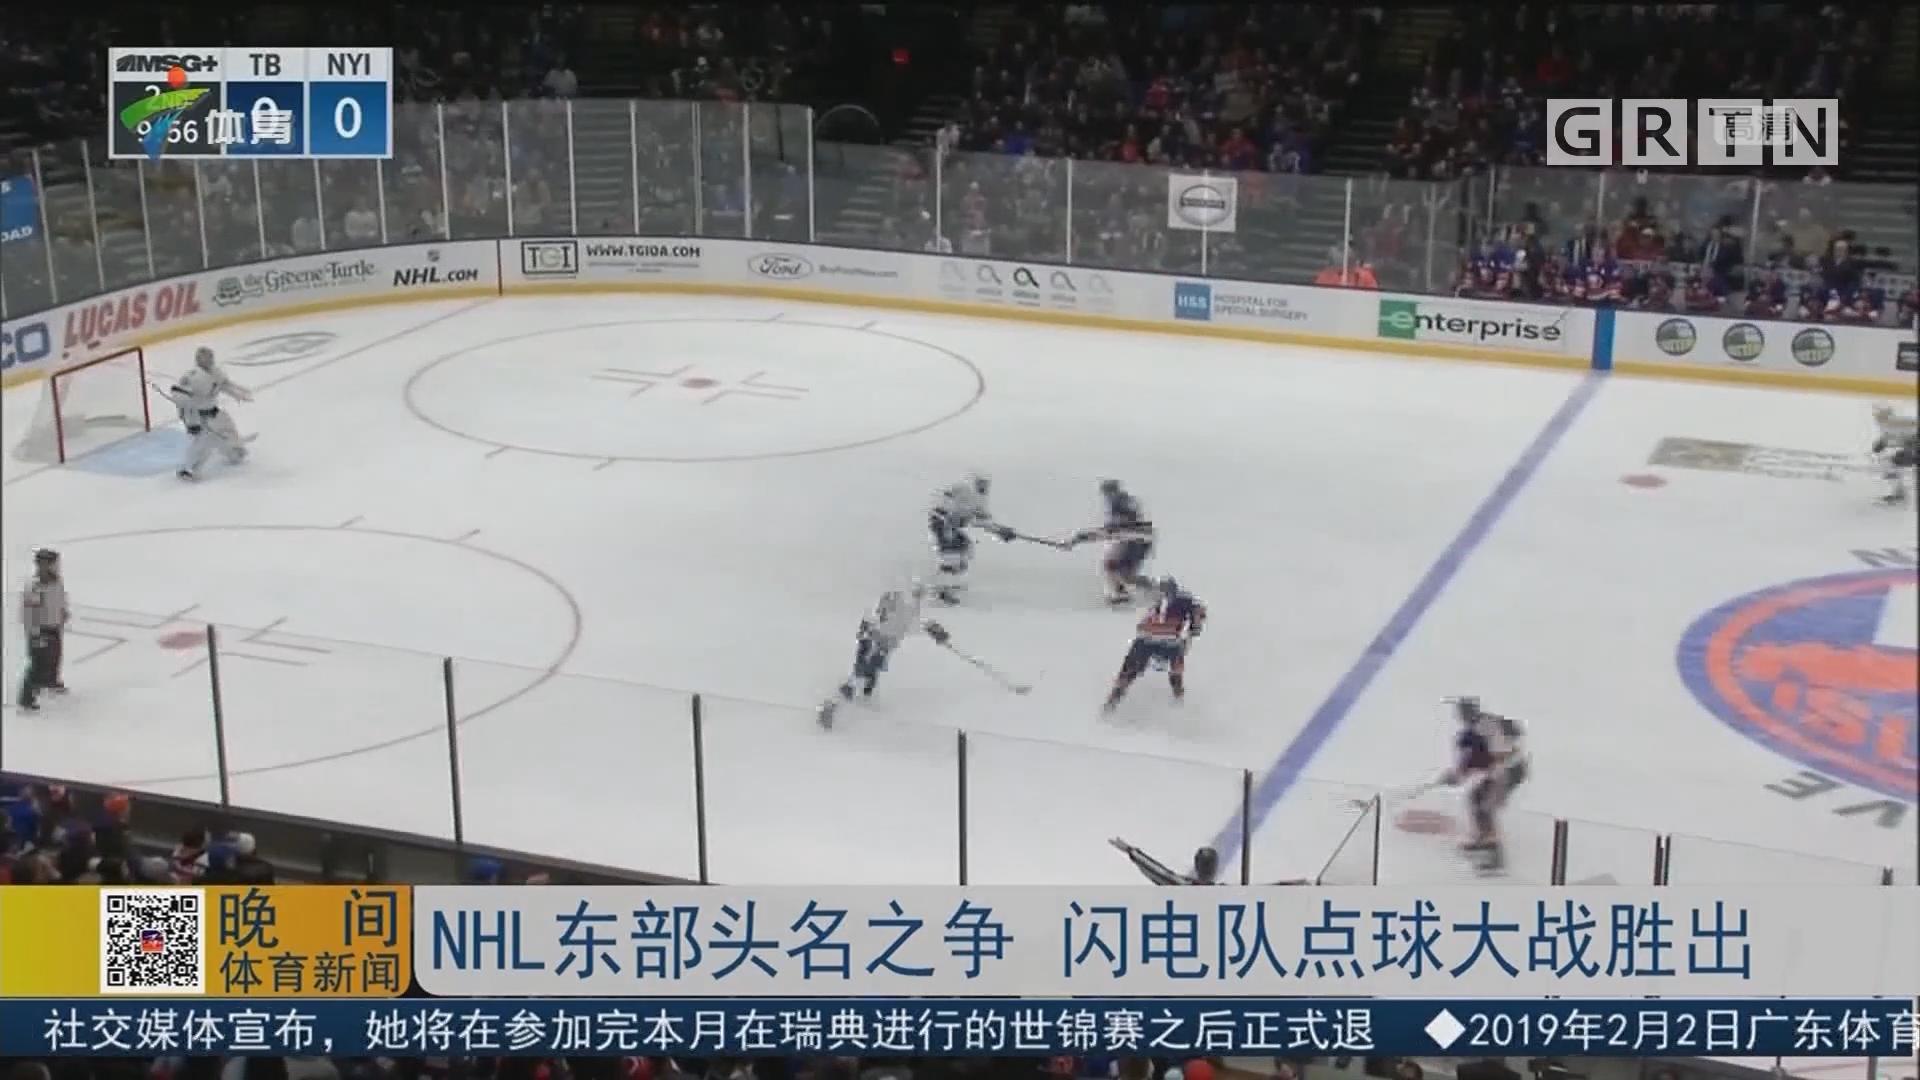 NHL东部头名之争 闪电队点球大战胜出